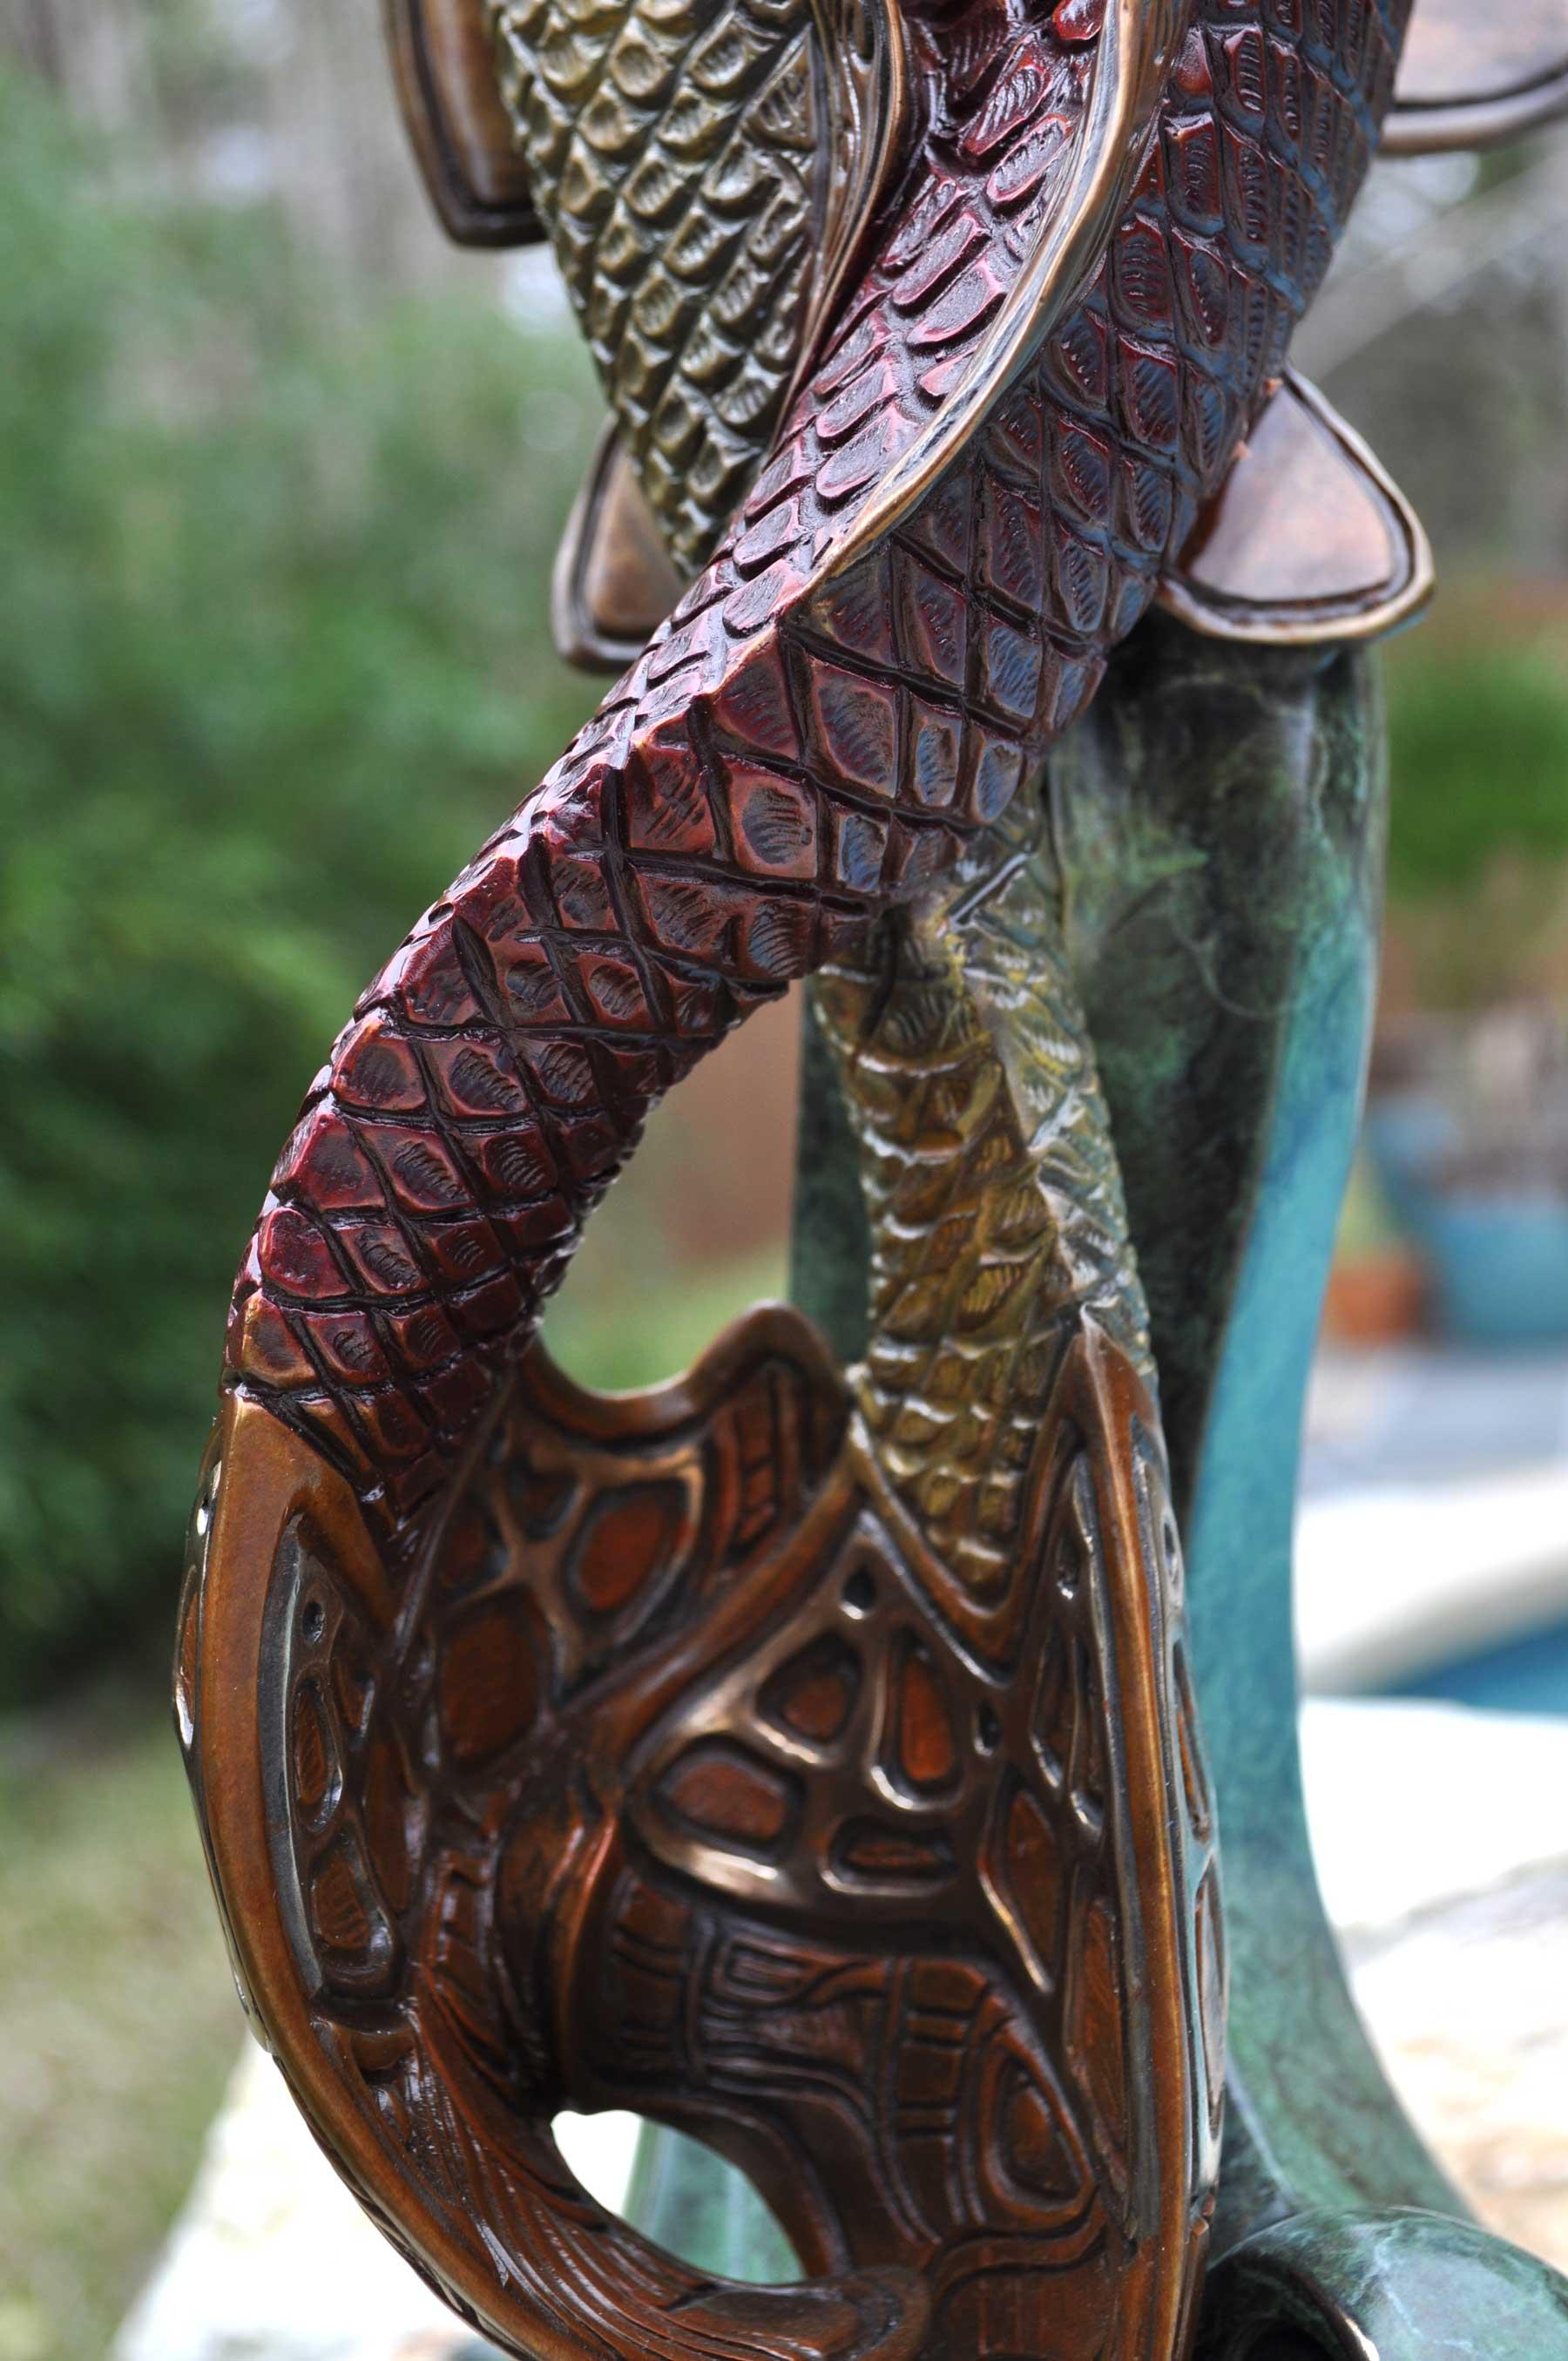 bronze-koi-fountain-sculpture-john-maisano-5.jpg